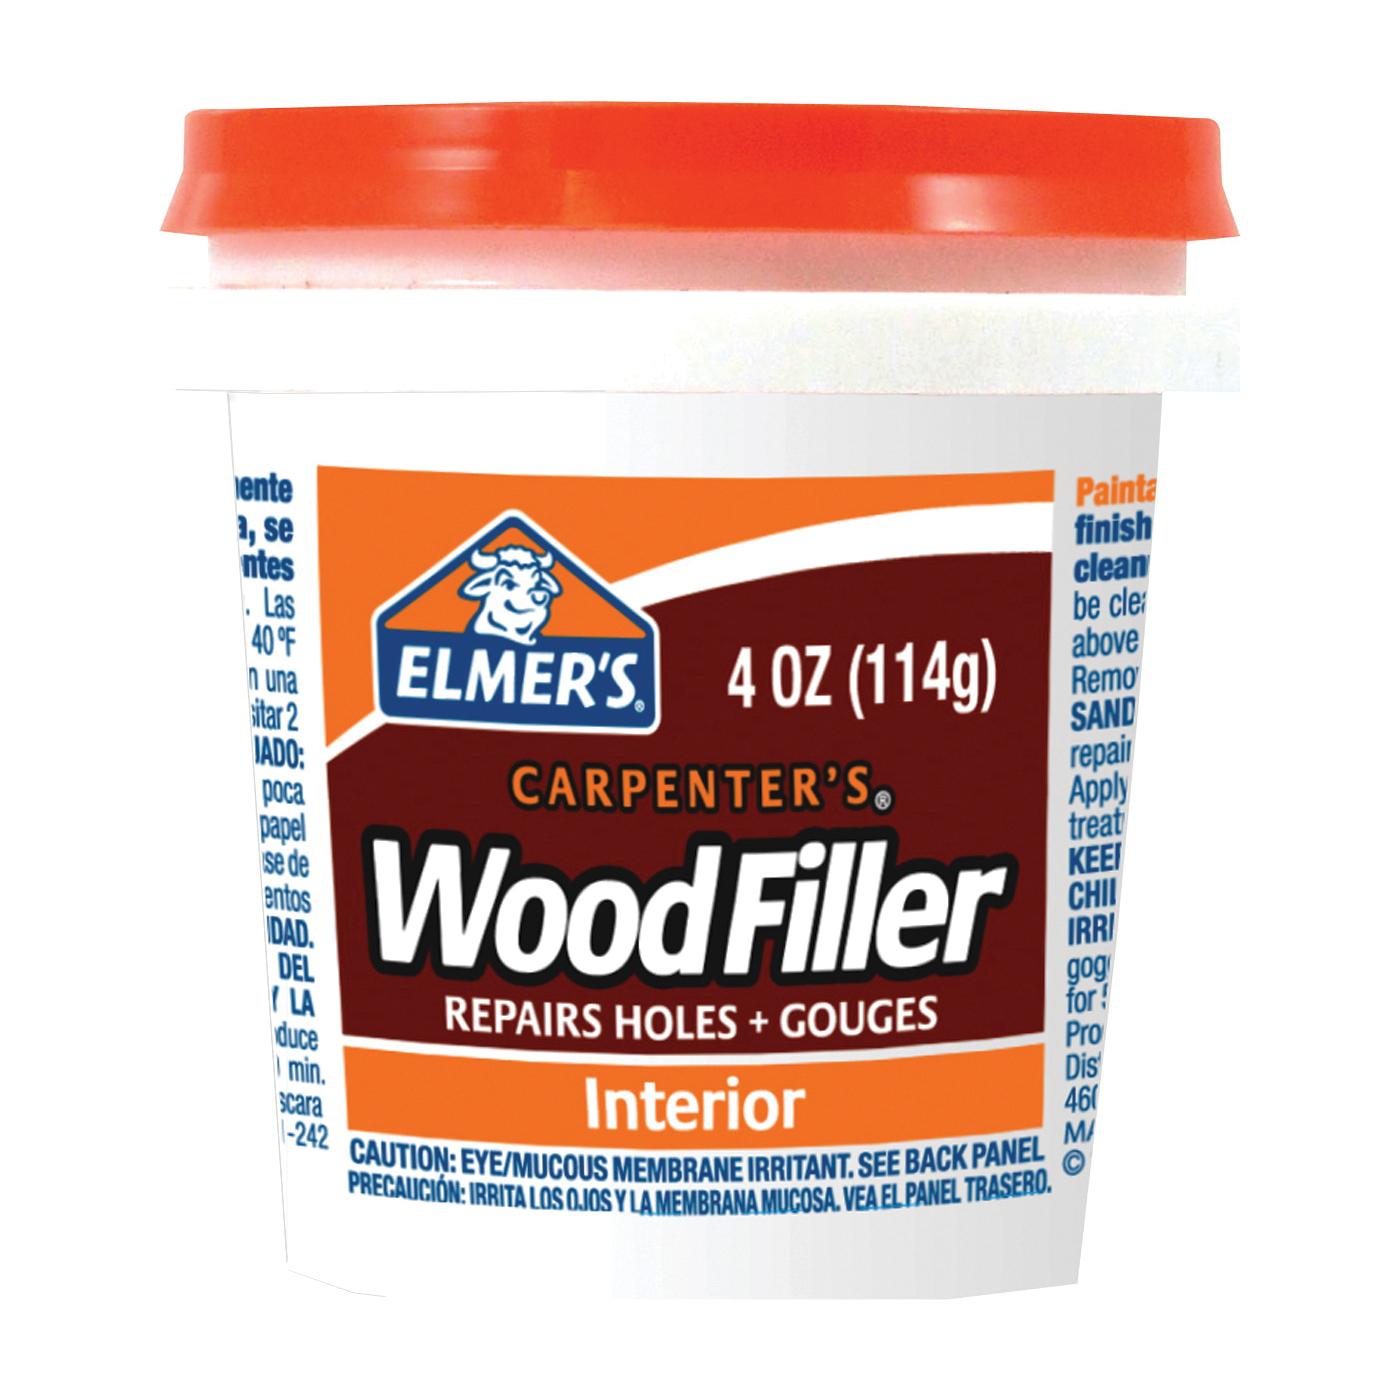 Picture of Elmers E847D12 Wood Filler, Paste, Mild Acrylic, Light Tan, 0.25 pt Package